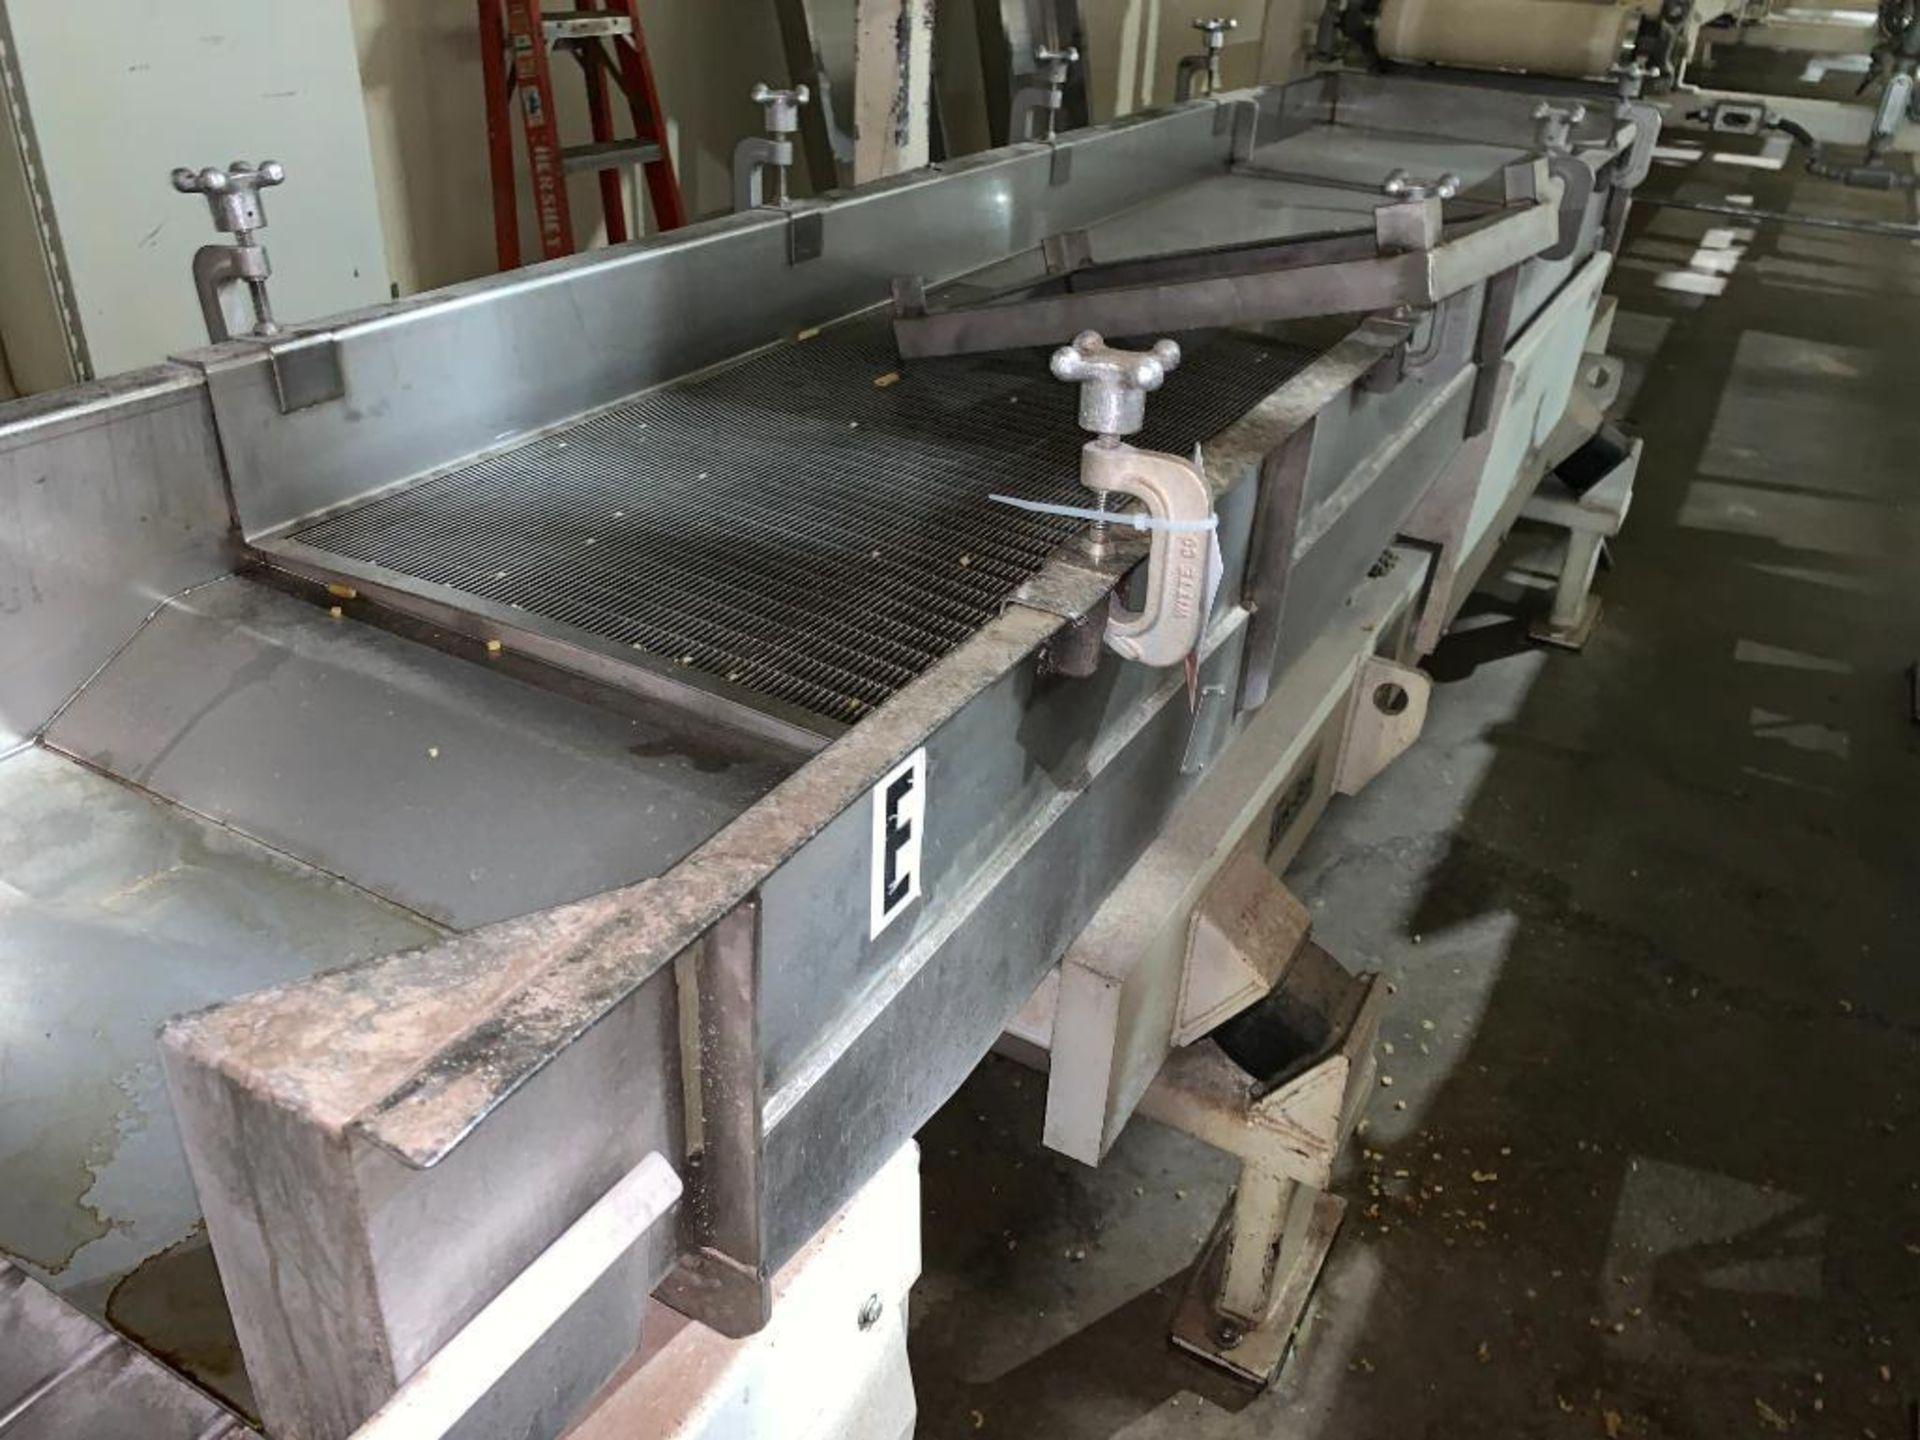 1993 Link-Belt stainless steel vibratory scalping conveyor - Image 10 of 10